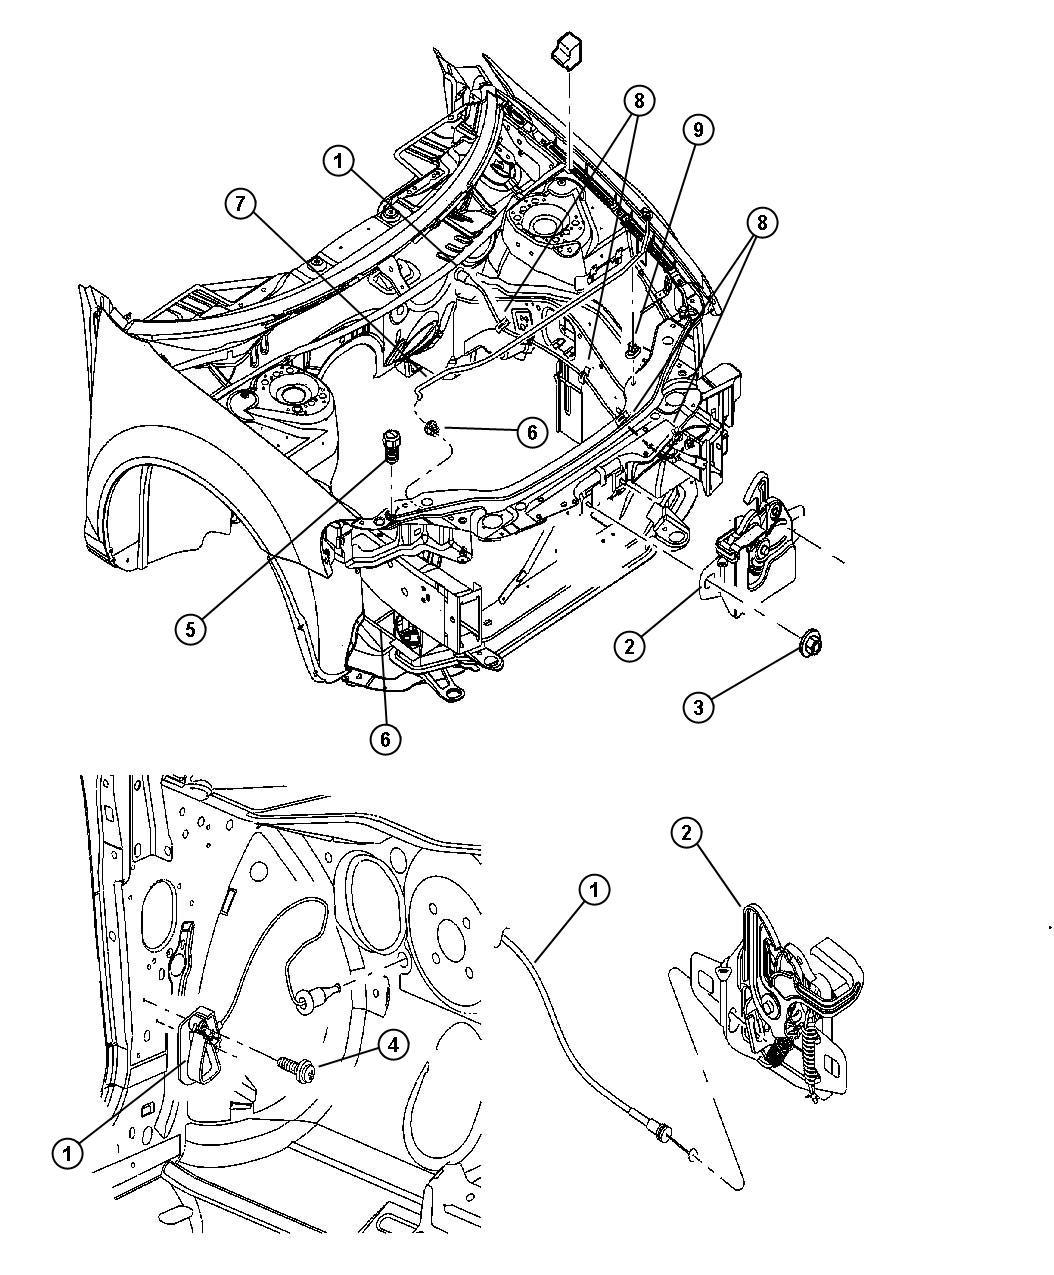 2005 Dodge Stratus Lever. Remote hood release. Body